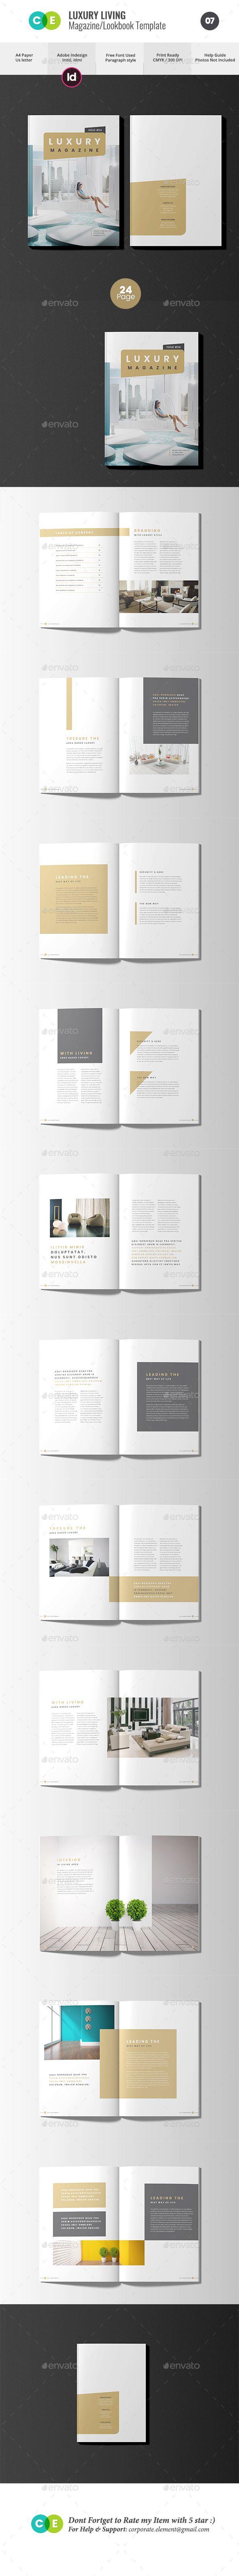 The #Magazine | Luxury Living Magazine V07 - Magazines Print Templates